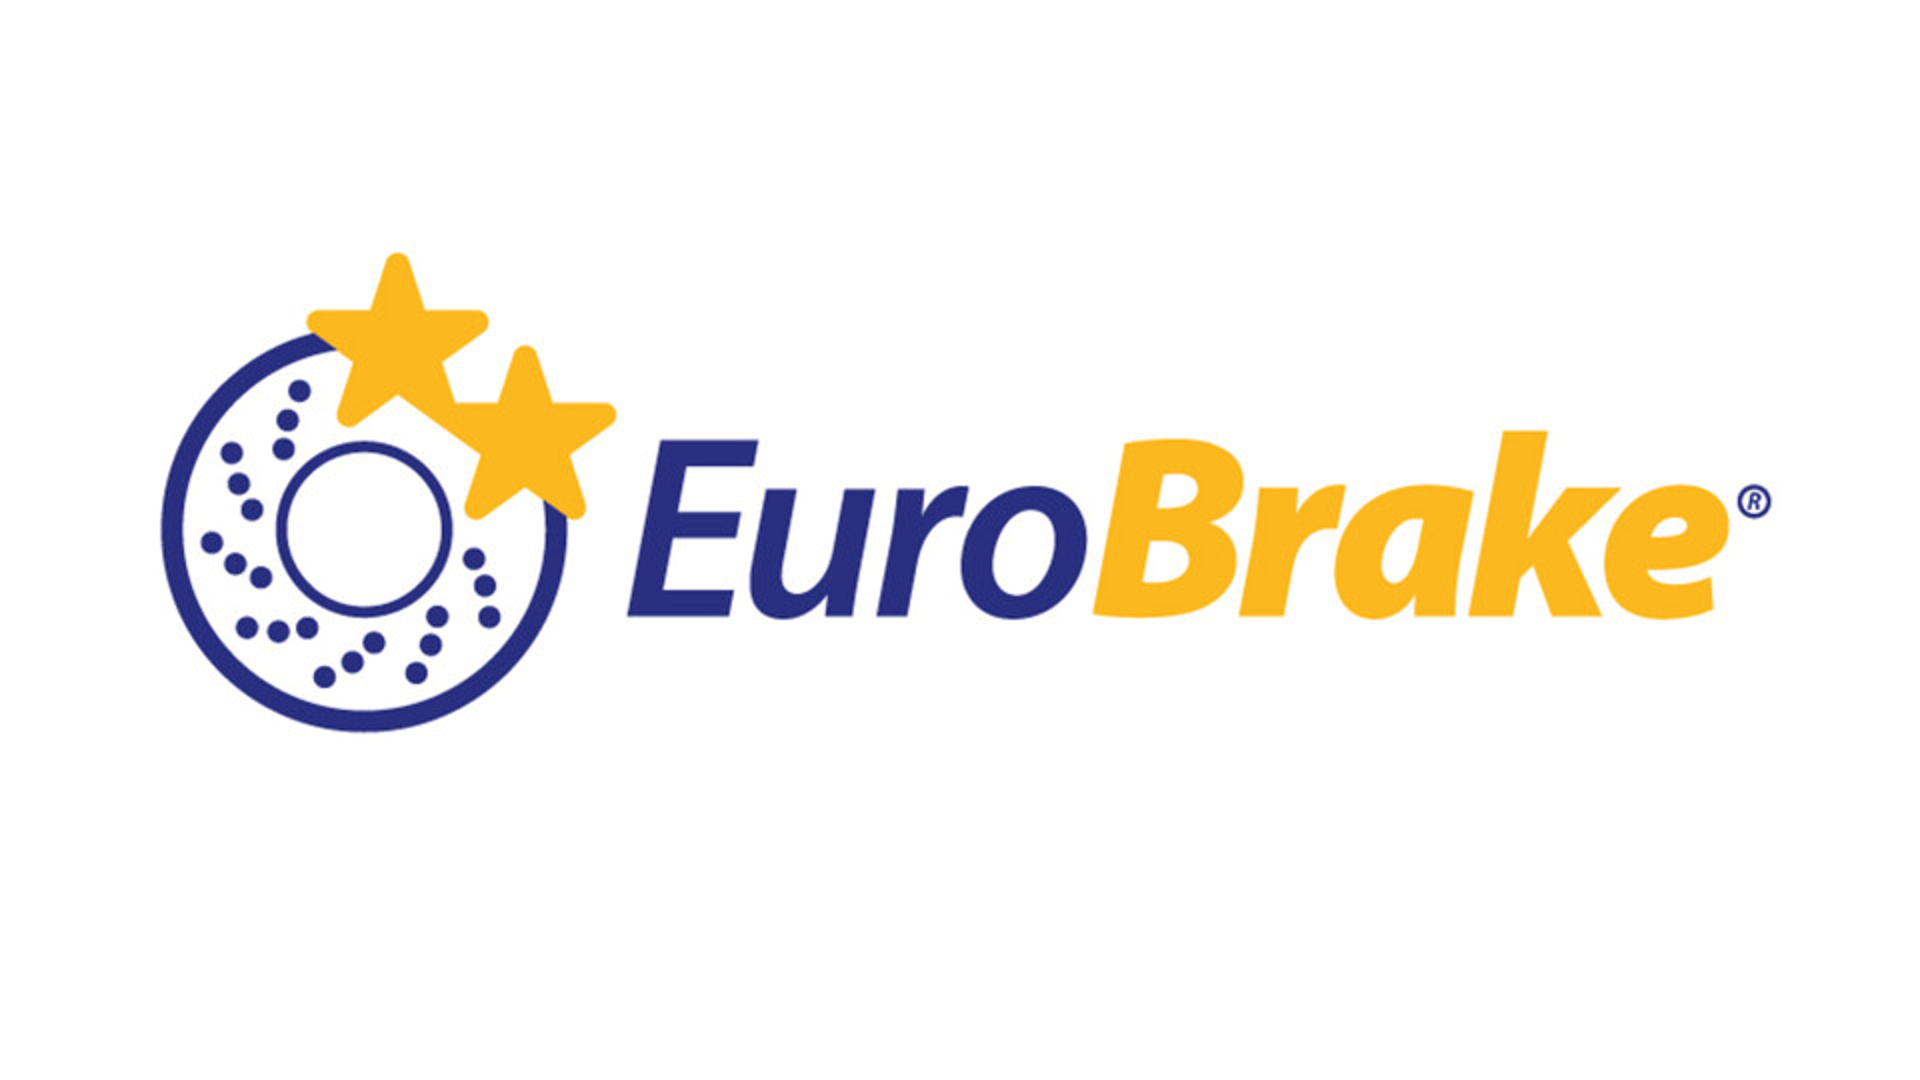 Euro Brake Logo, Events